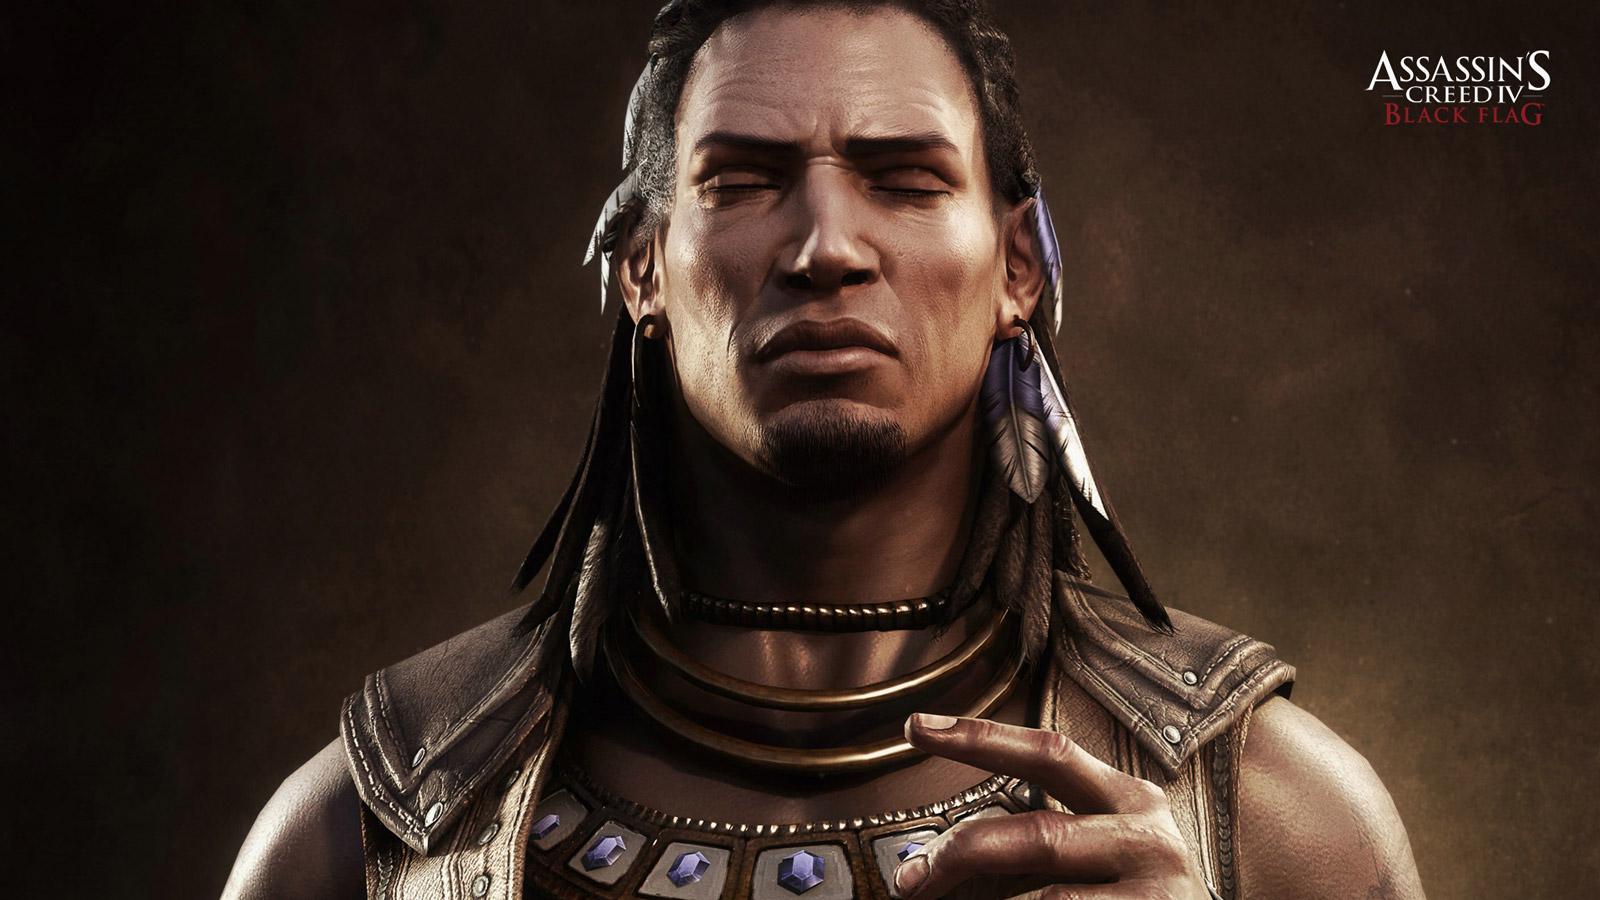 Assassin's Creed IV: Black Flag Wallpaper in 1600x900